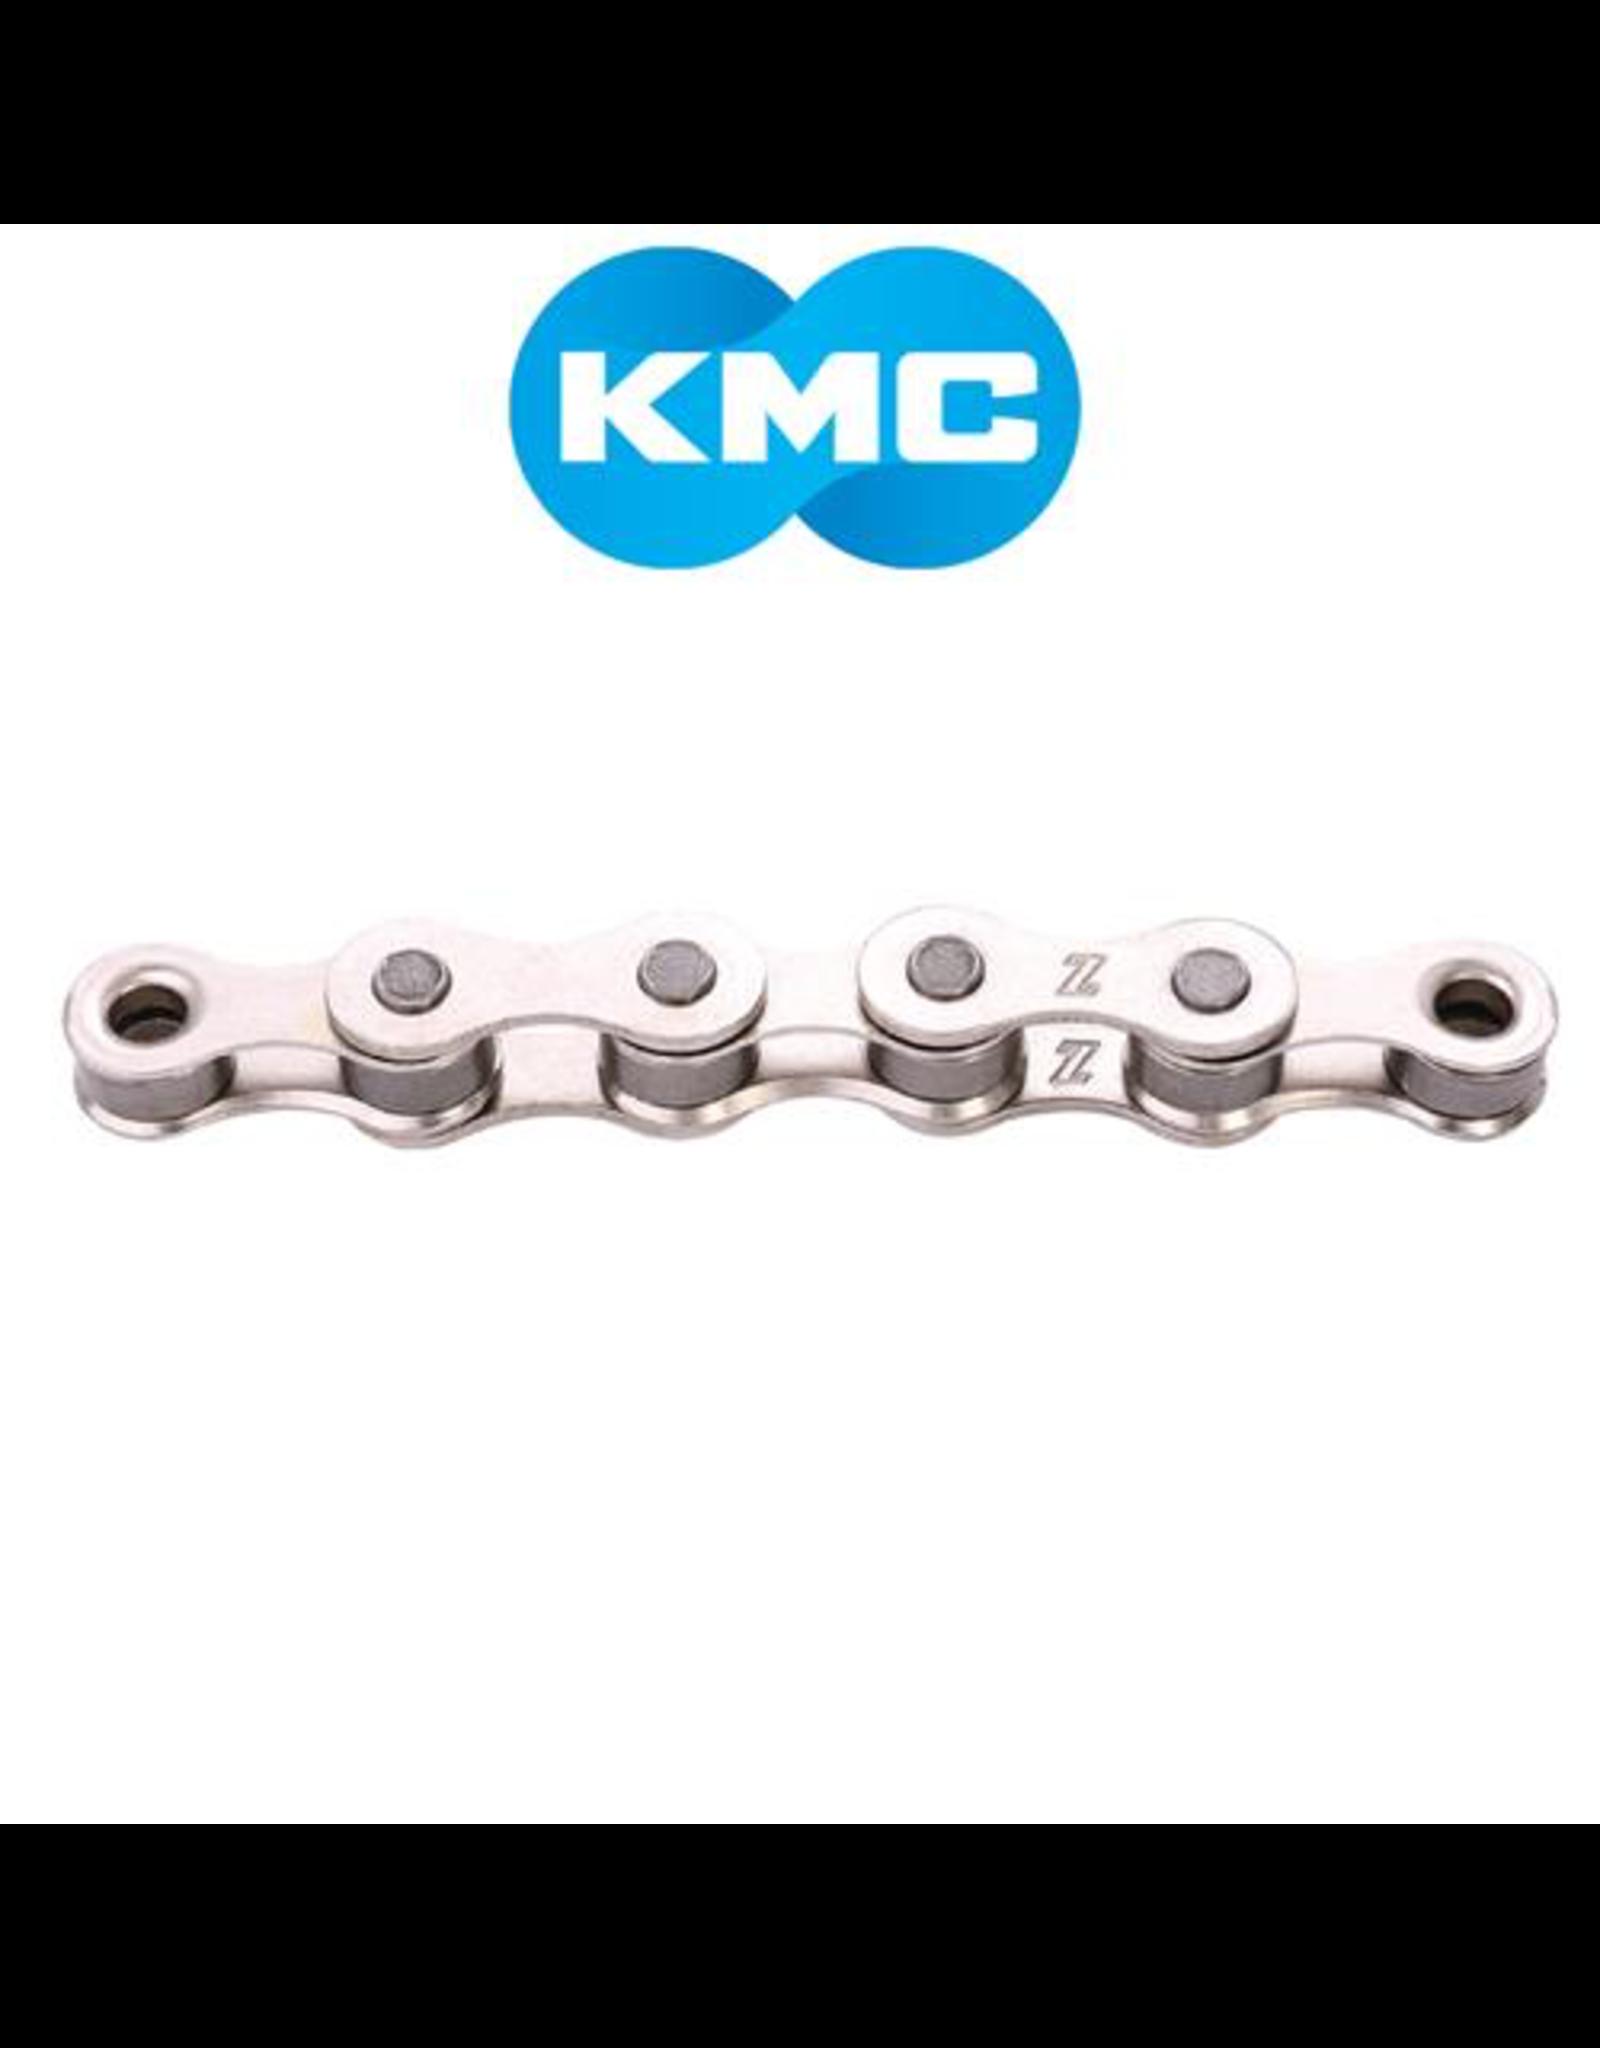 "KMC CHAIN KMC S1 1/2X1/8"" SINGLE SPEED 116 LINKS SILVER"